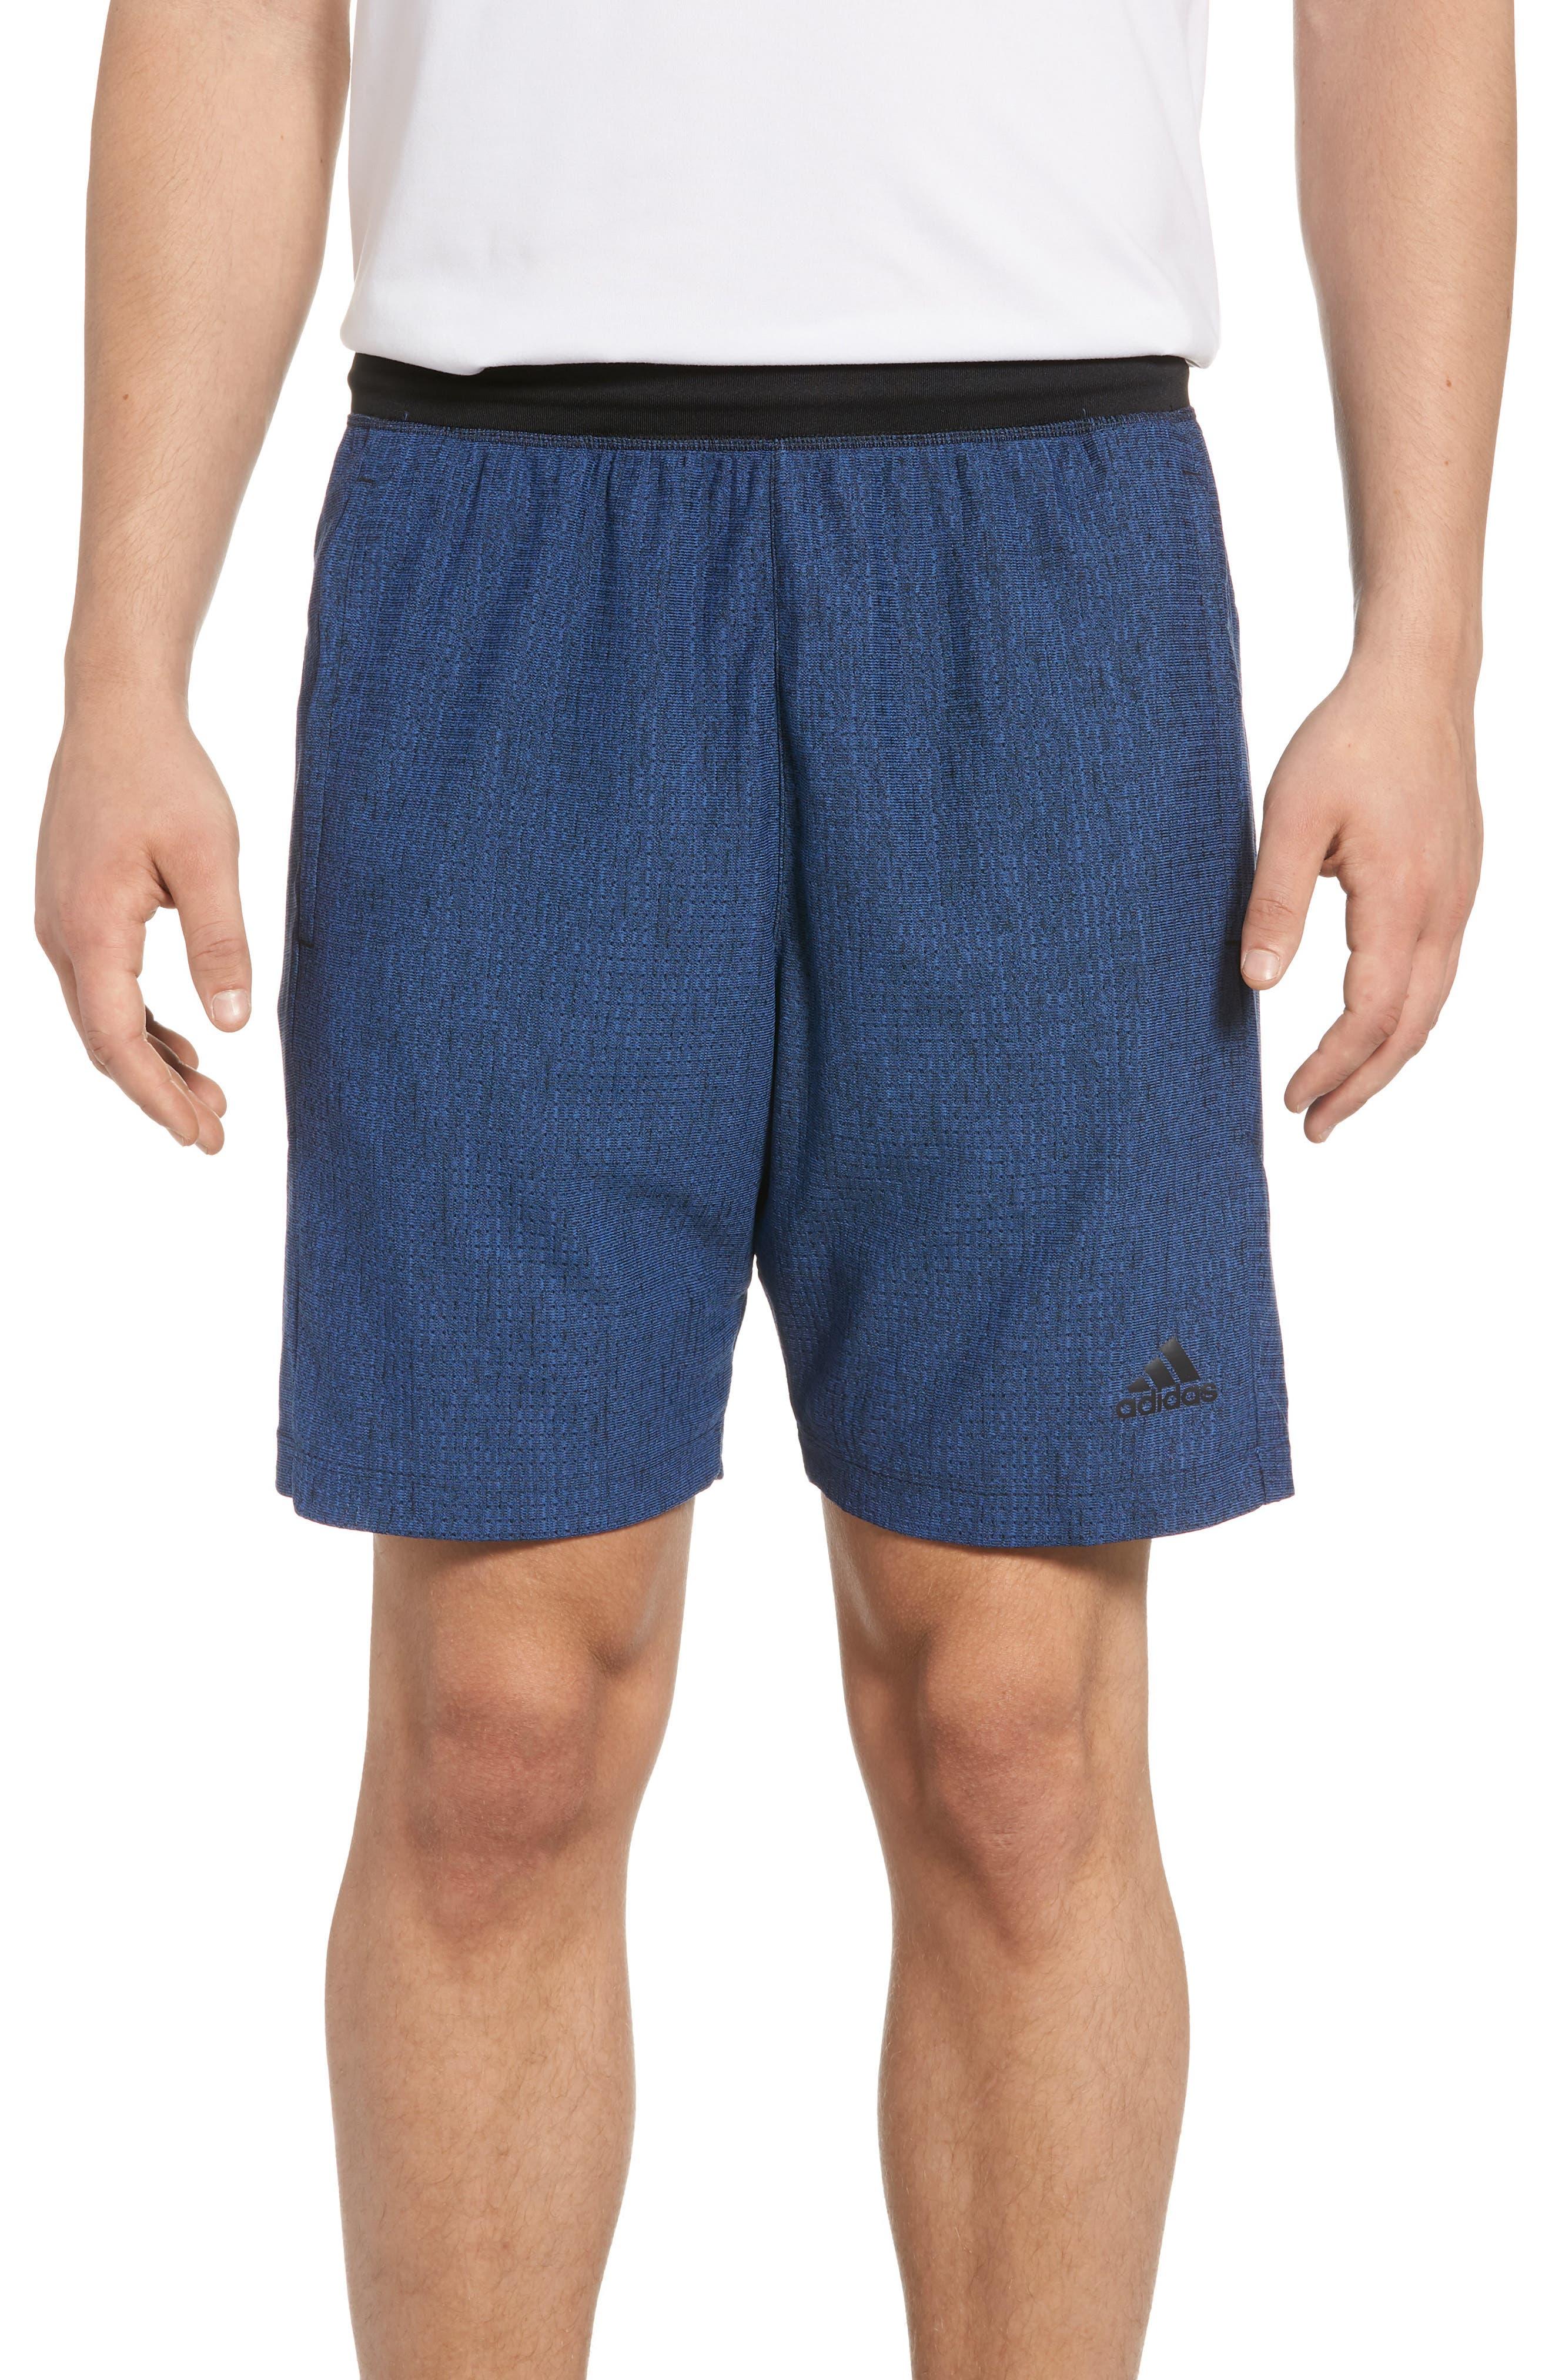 Speedbreaker Shorts,                             Main thumbnail 1, color,                             Hi-Res Blue